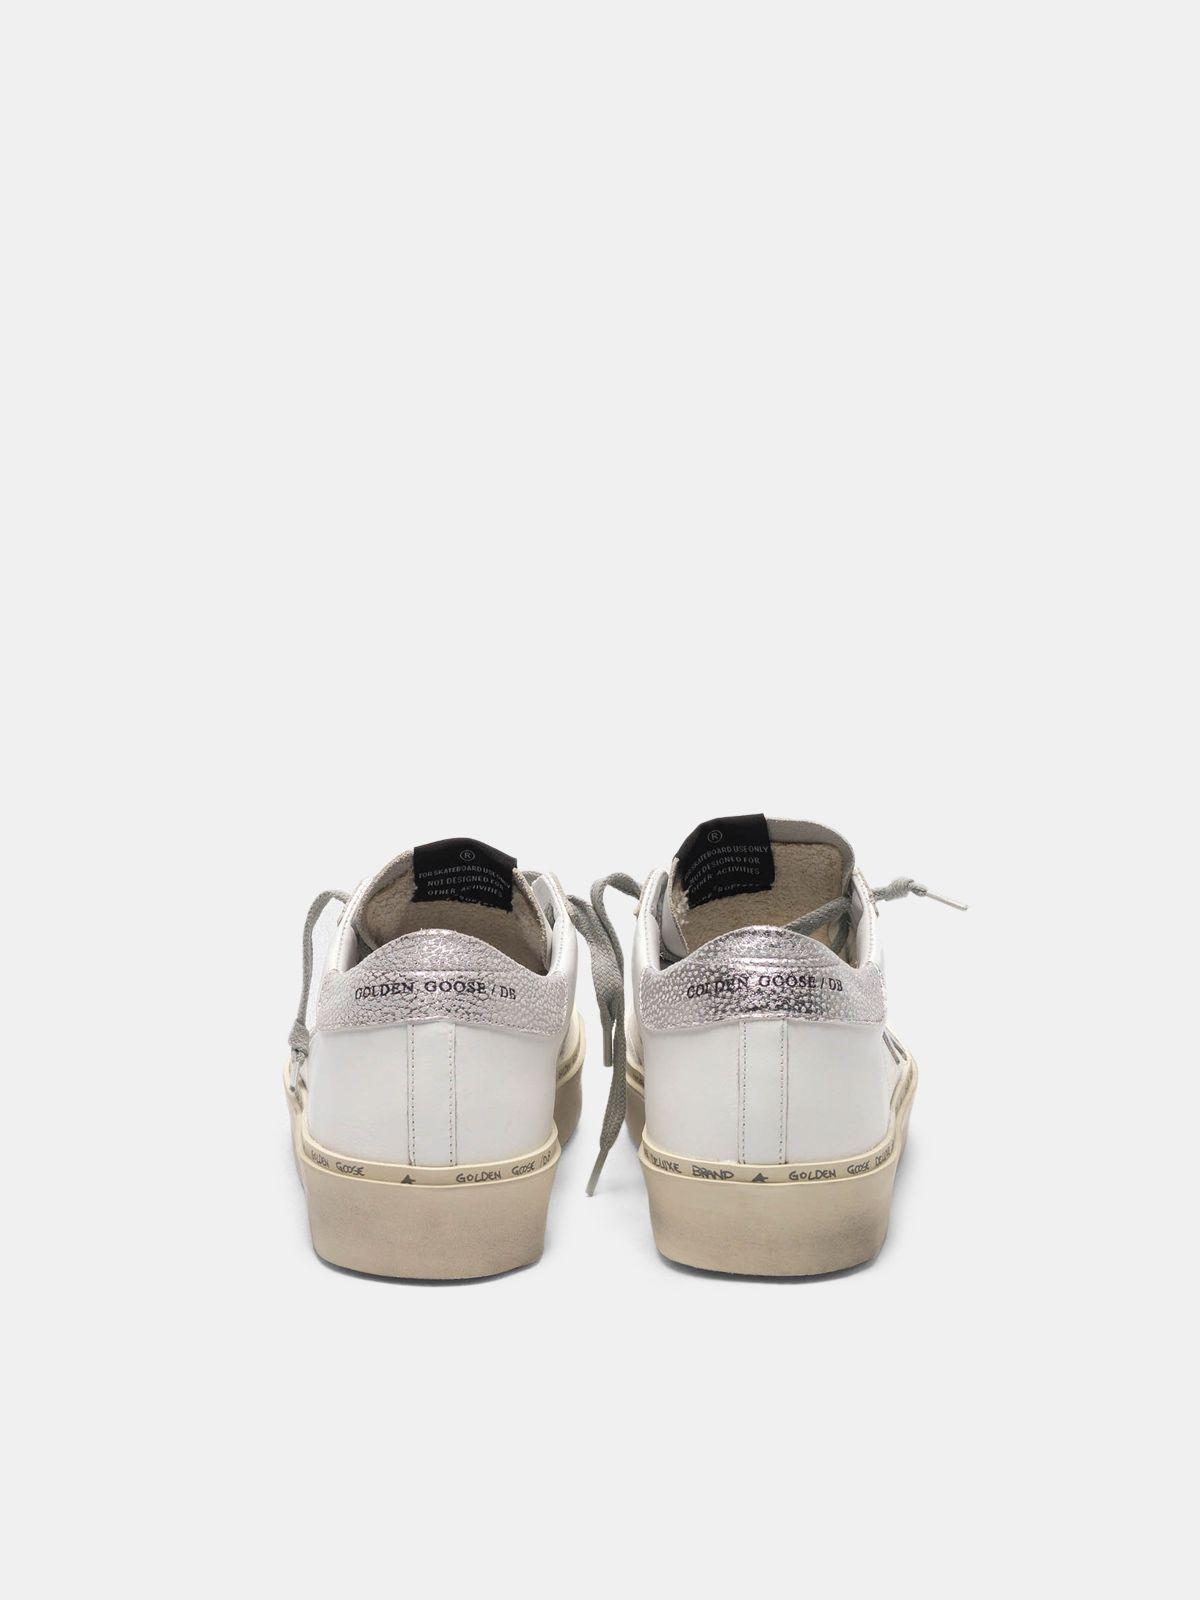 Golden Goose - Hi Star sneakers with star and heel tab in metallic silver in